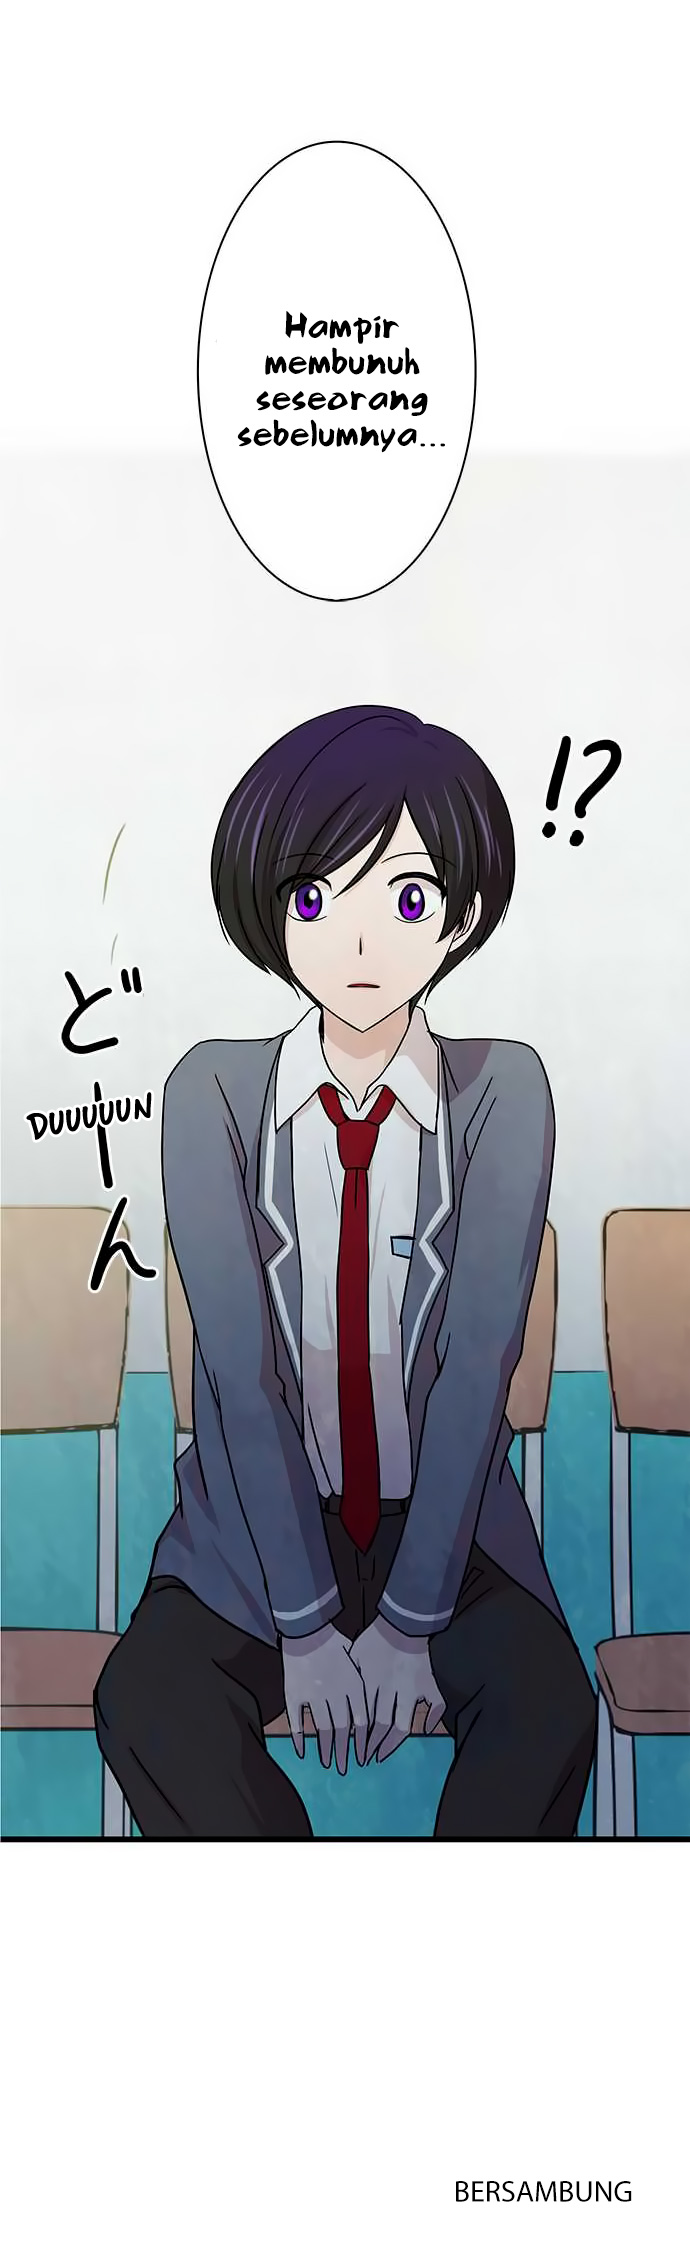 Baca Komik I Want To Be Normal Chapter 11 Komik Station